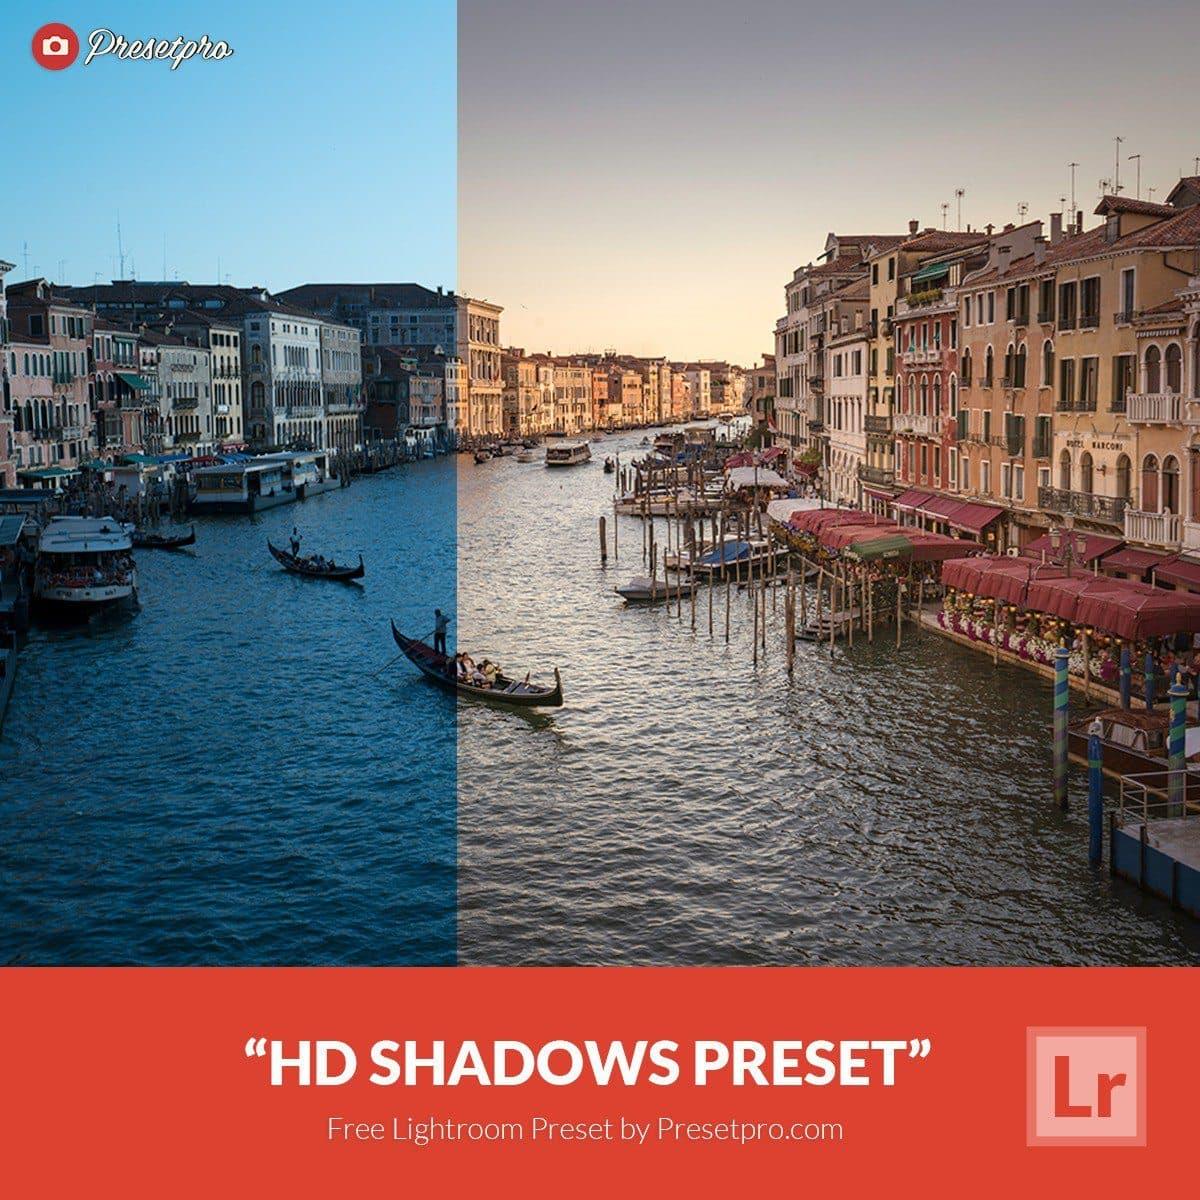 Free-Lightroom-Preset-HD-Shadows-Presetpro